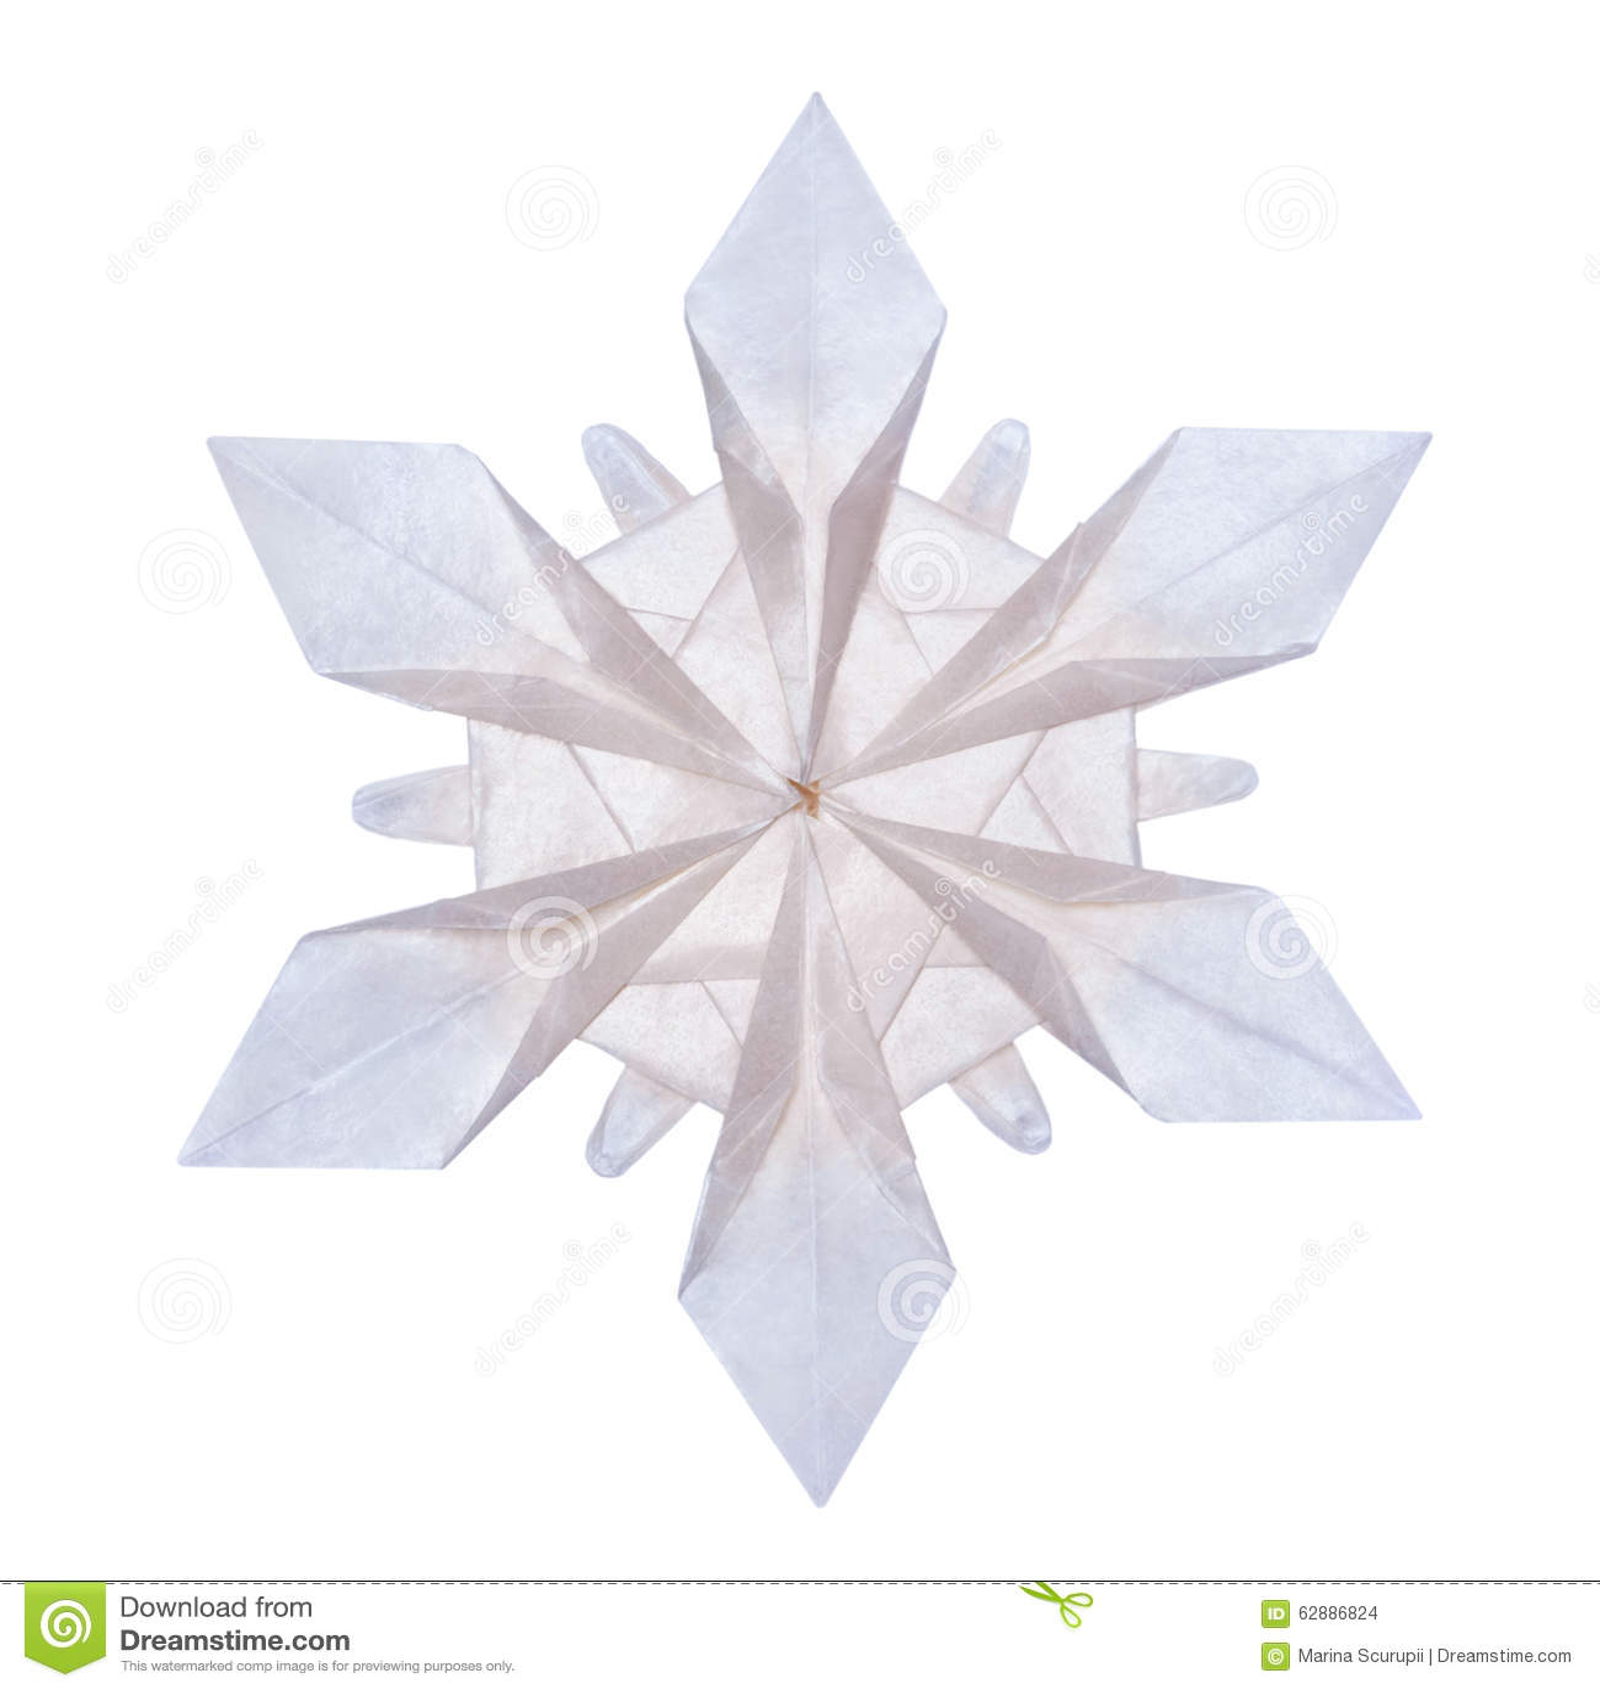 Origami Snowflakes Stock Photo Image Of Blue Element 62886824